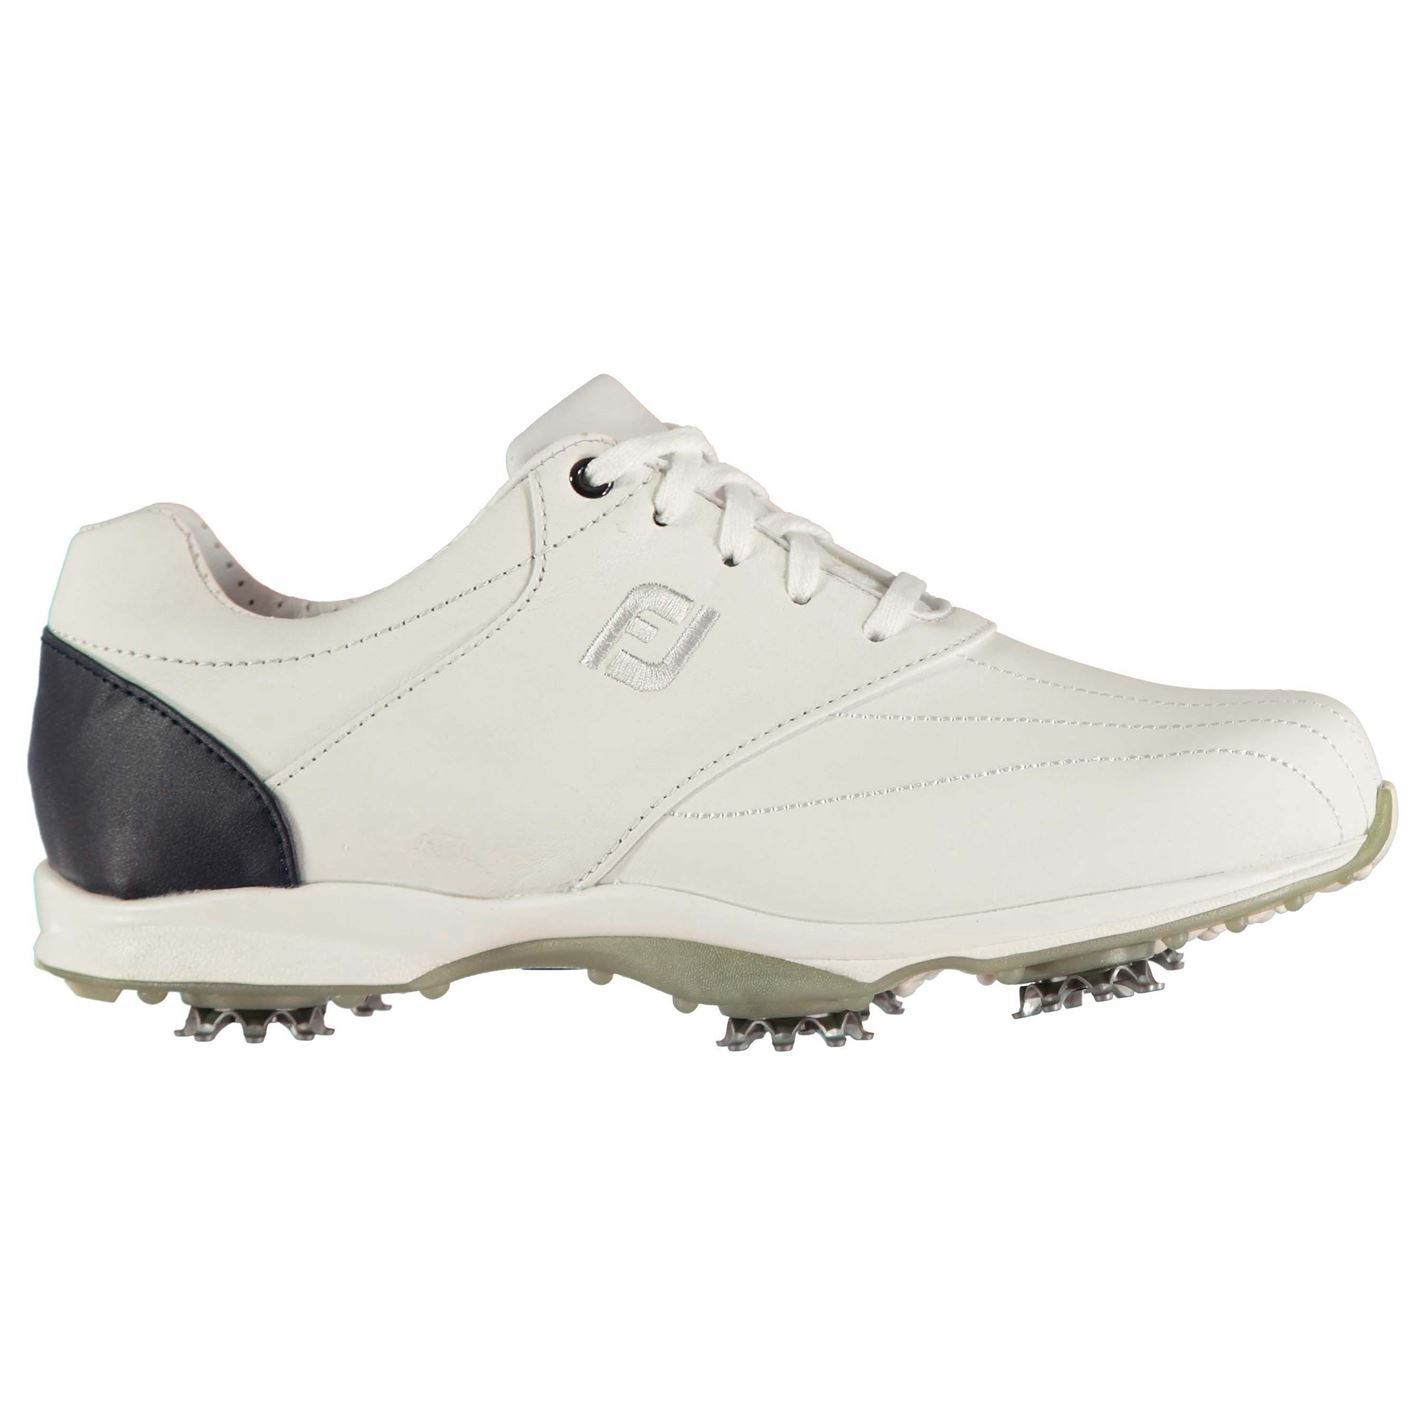 3b802b77f11 Footjoy-Embody-Ladies-Golf-Shoes-Spikes-Trainers-Footwear thumbnail